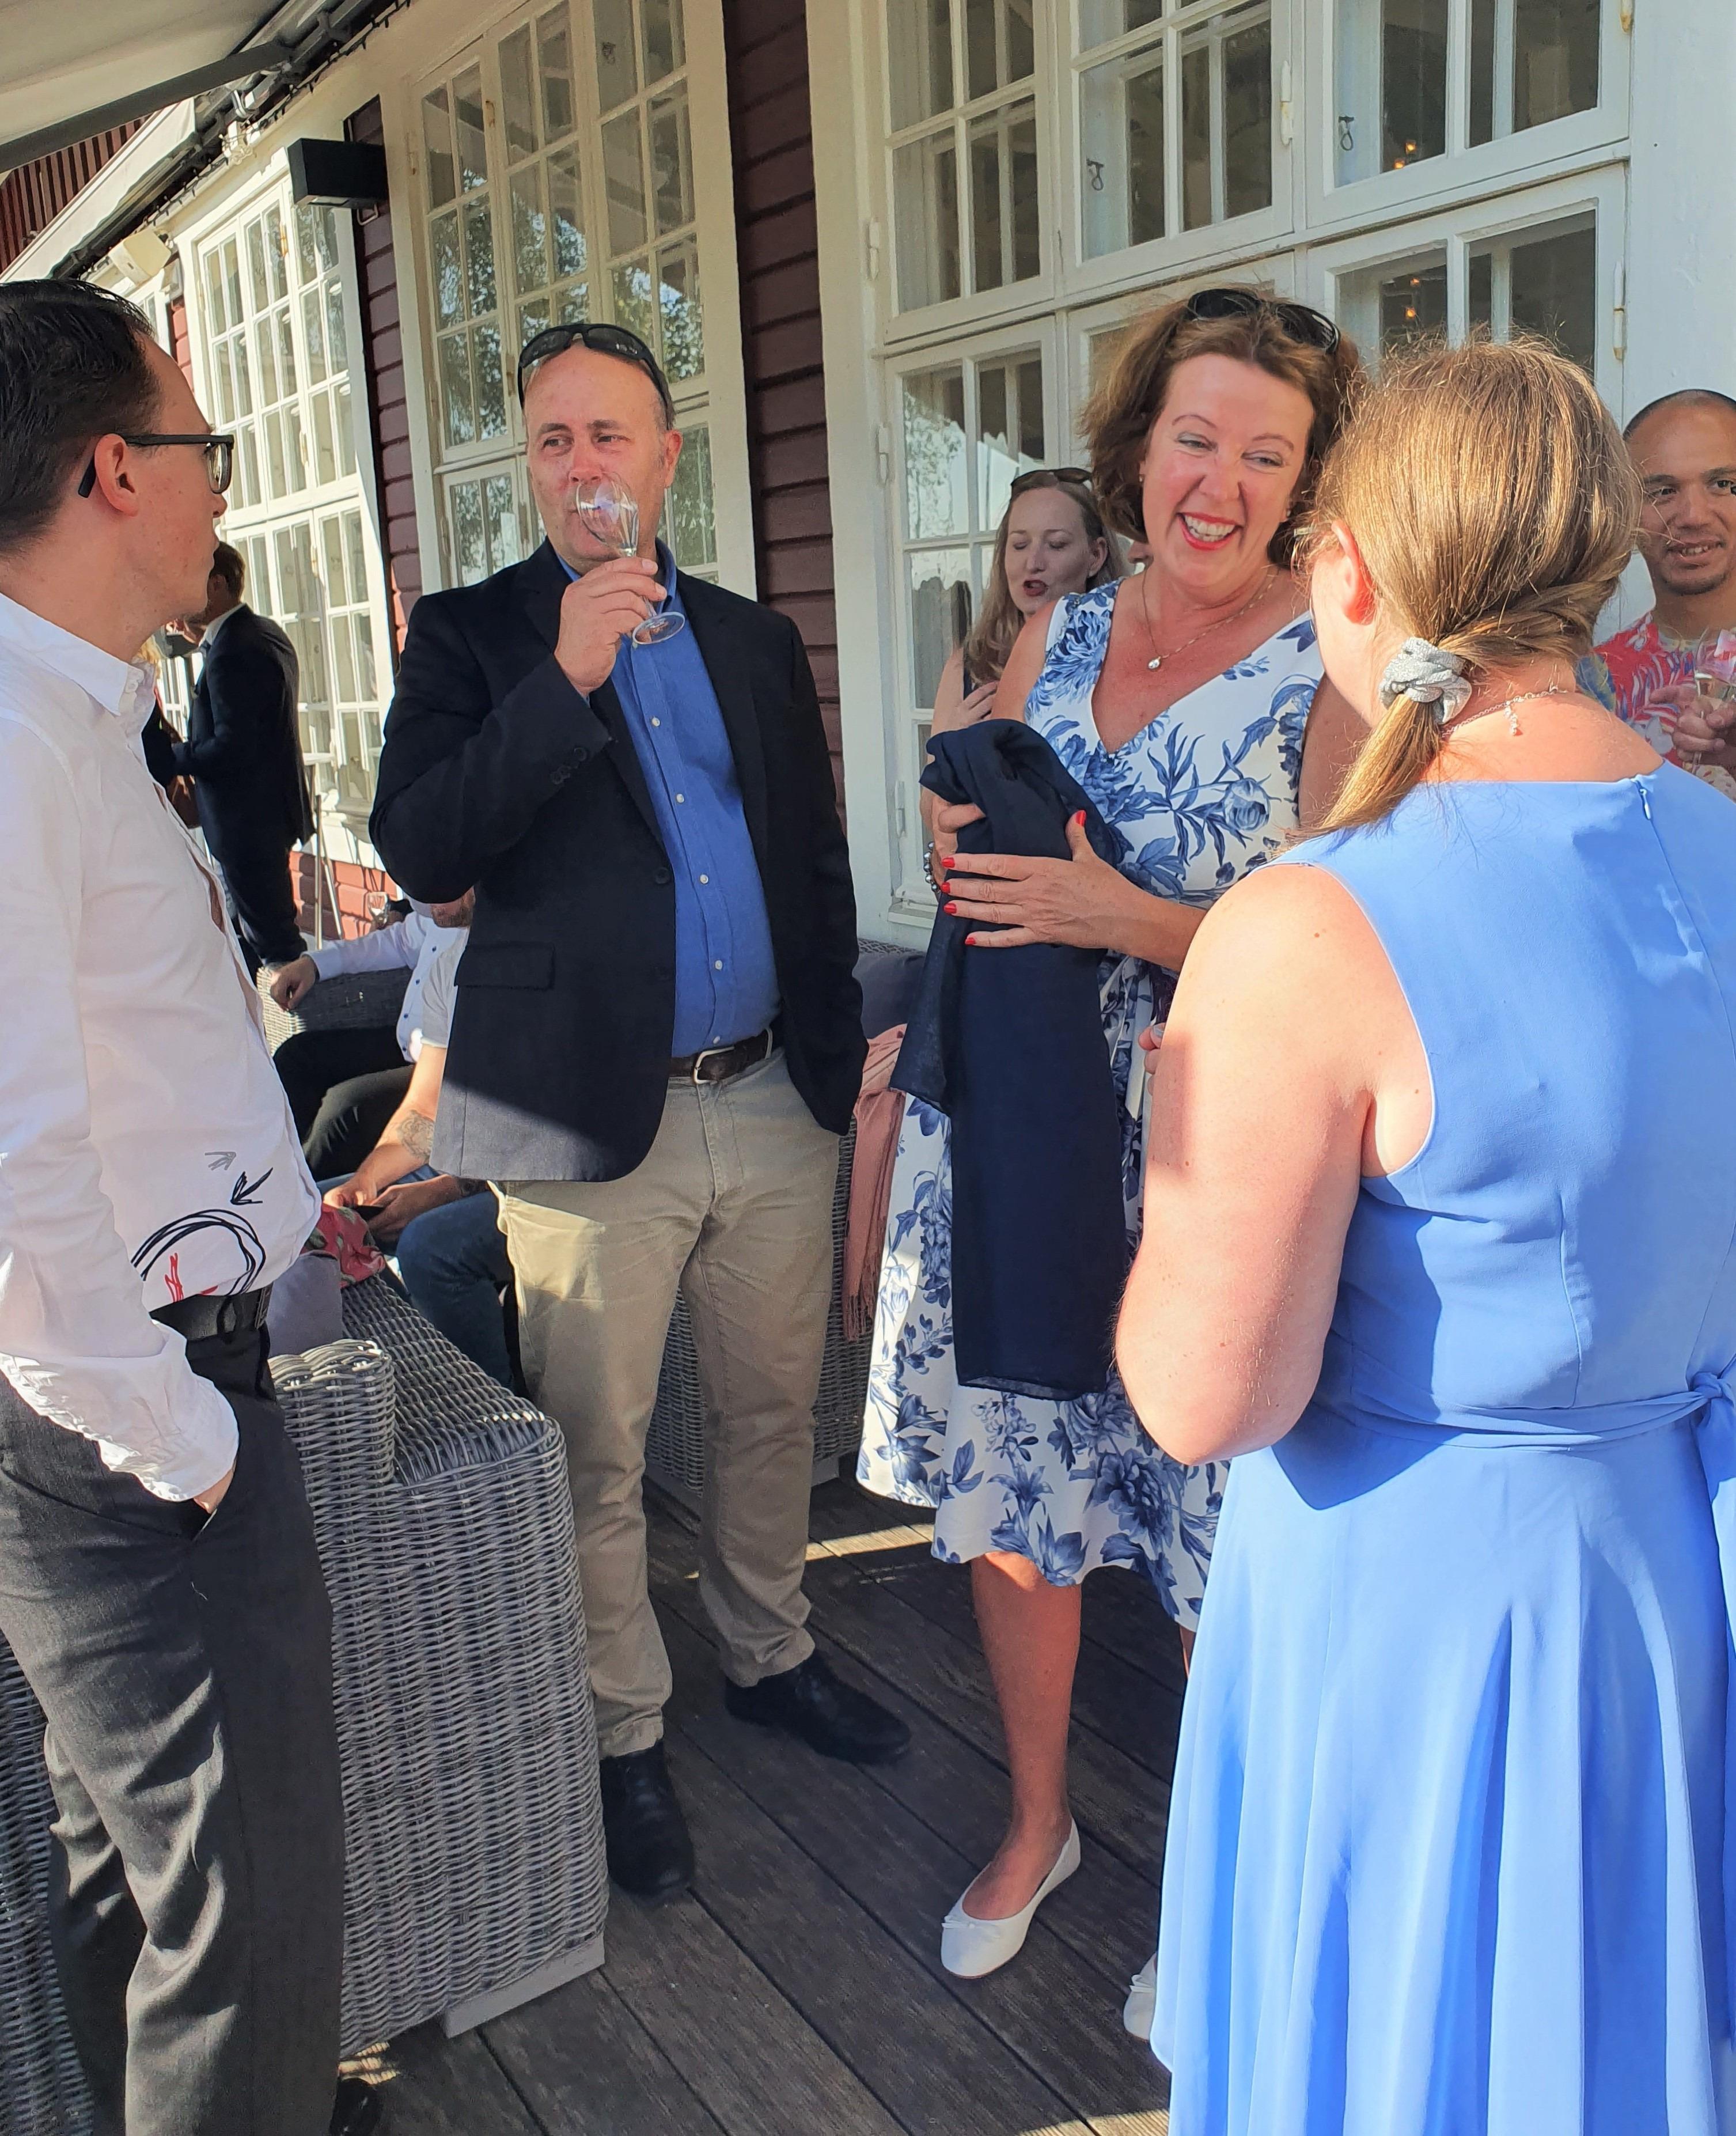 Sommarfest 2019 på Elicit, 20-årsjubileum